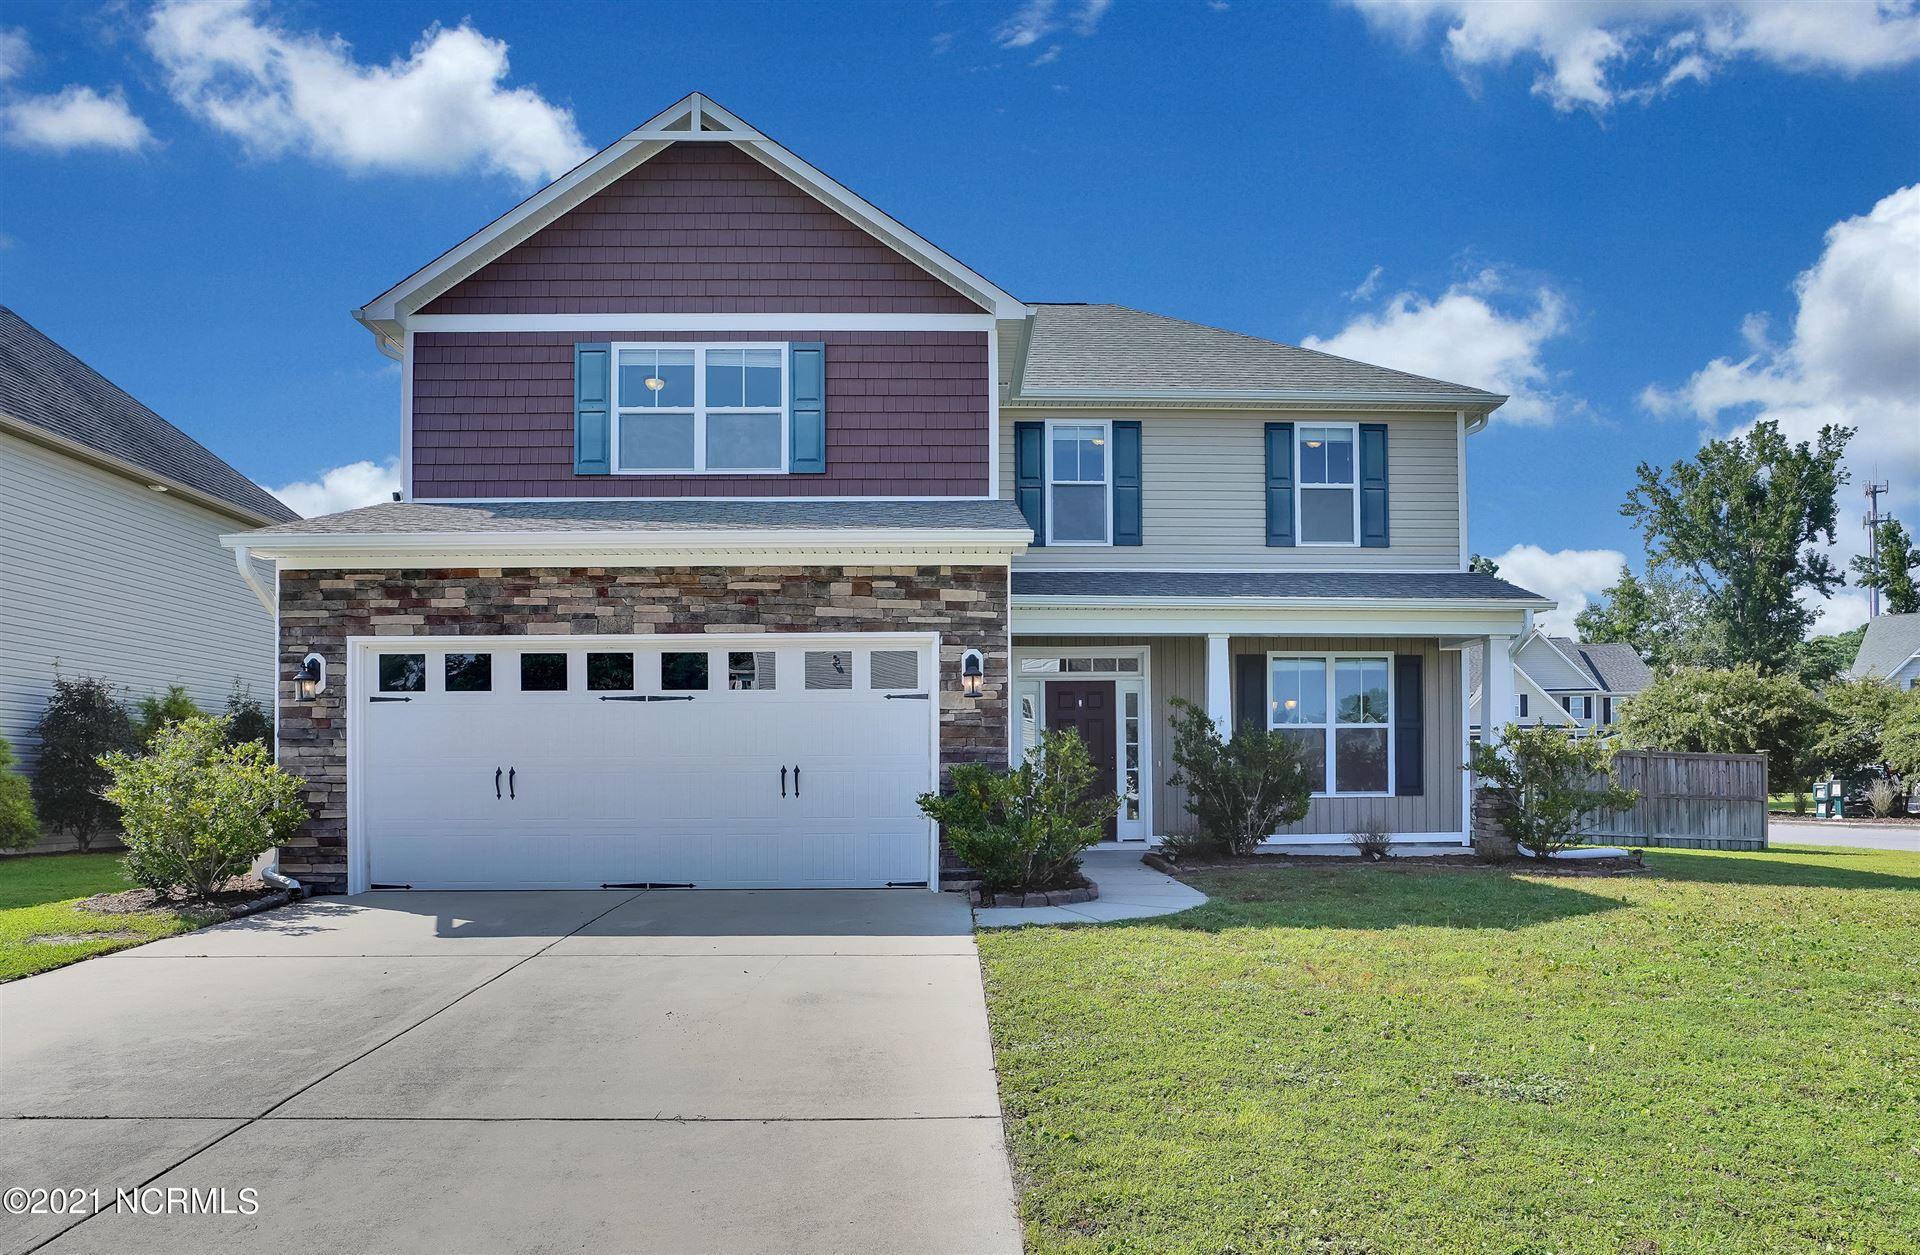 Photo for 8437 Rosemary Lane, Wilmington, NC 28411 (MLS # 100285905)